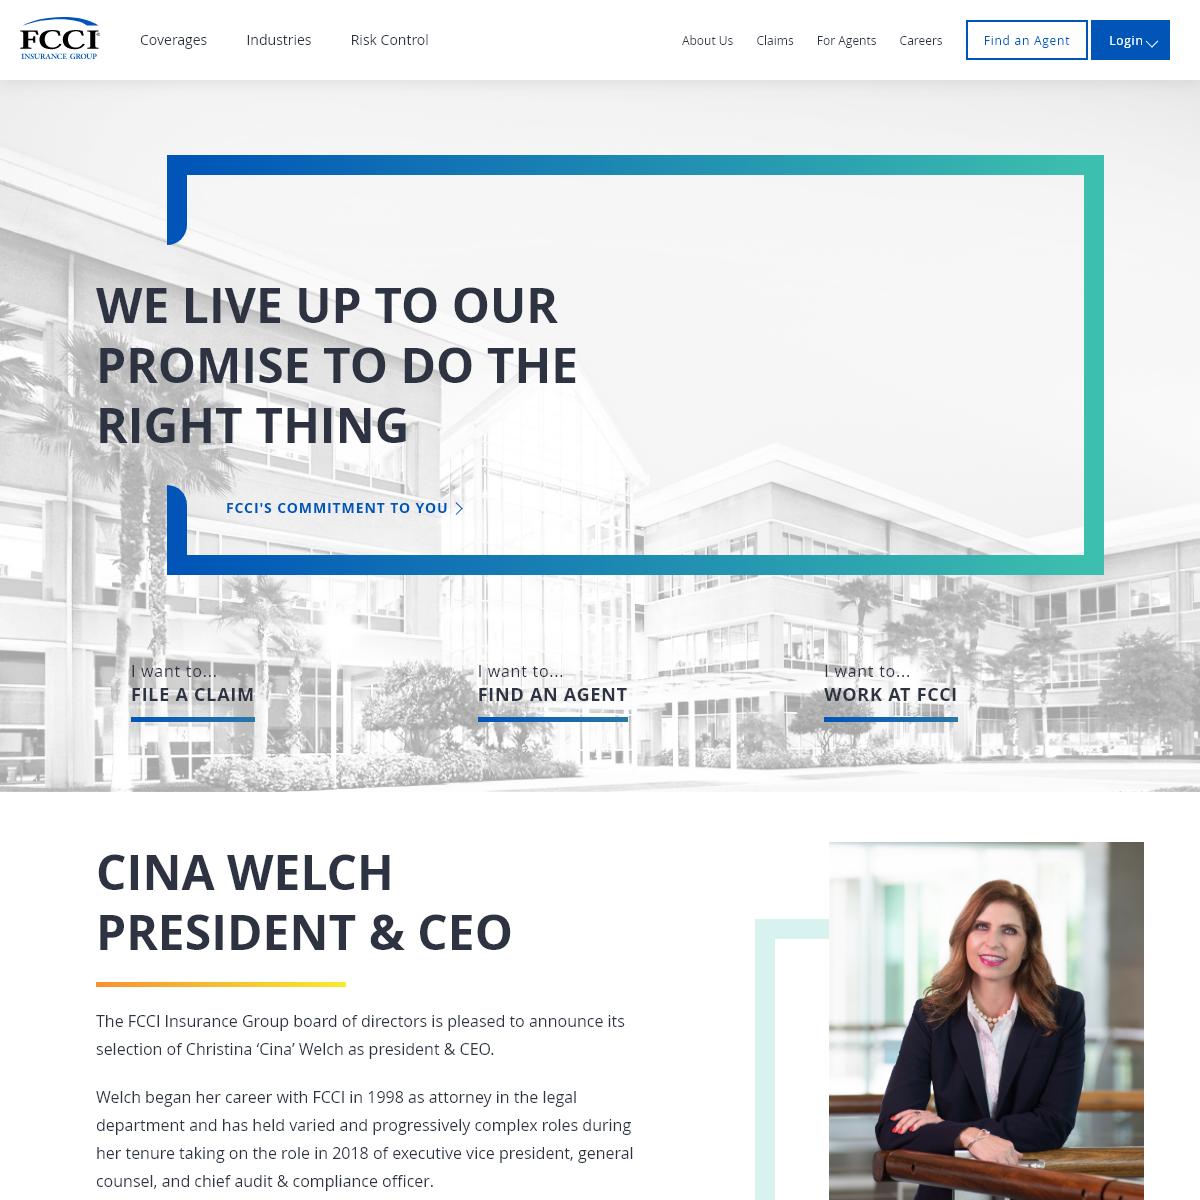 Business, Commercial Insurance - FCCI Insurance Group